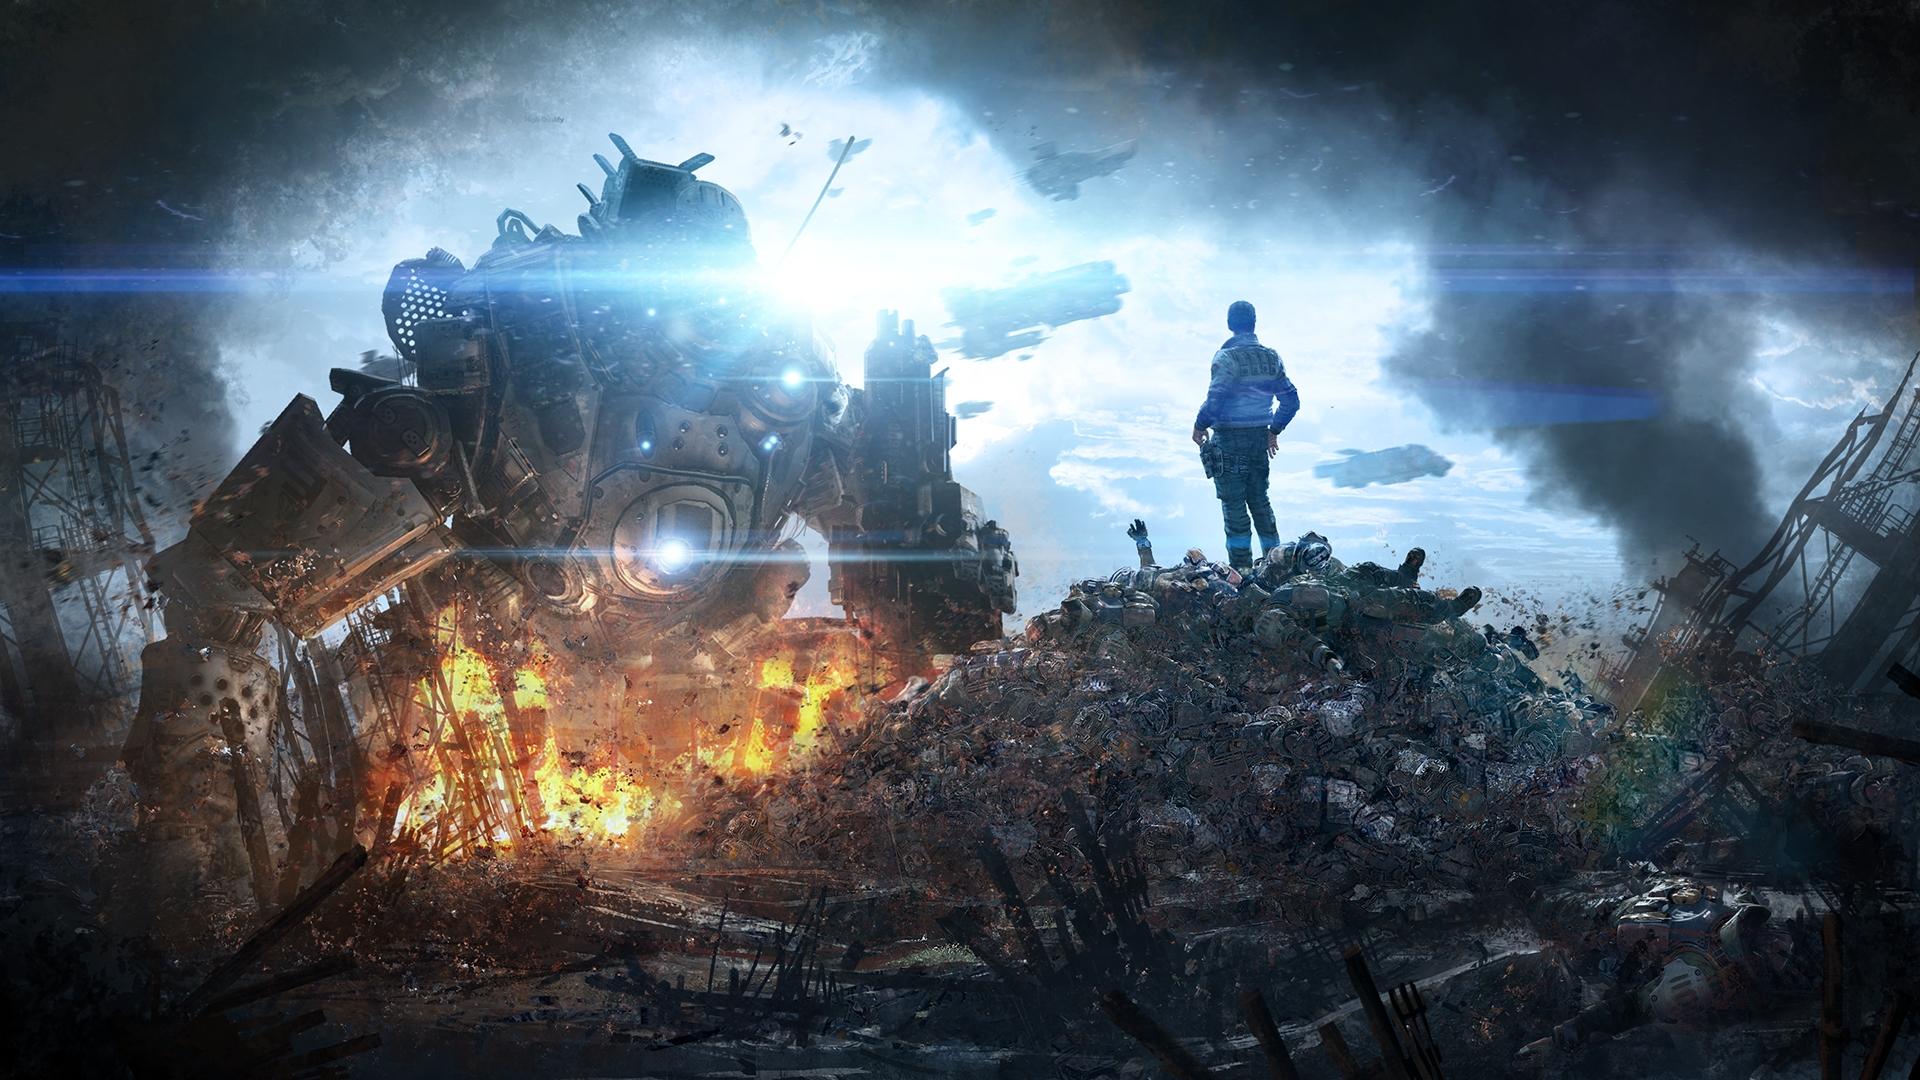 Арт к игре Titanfall